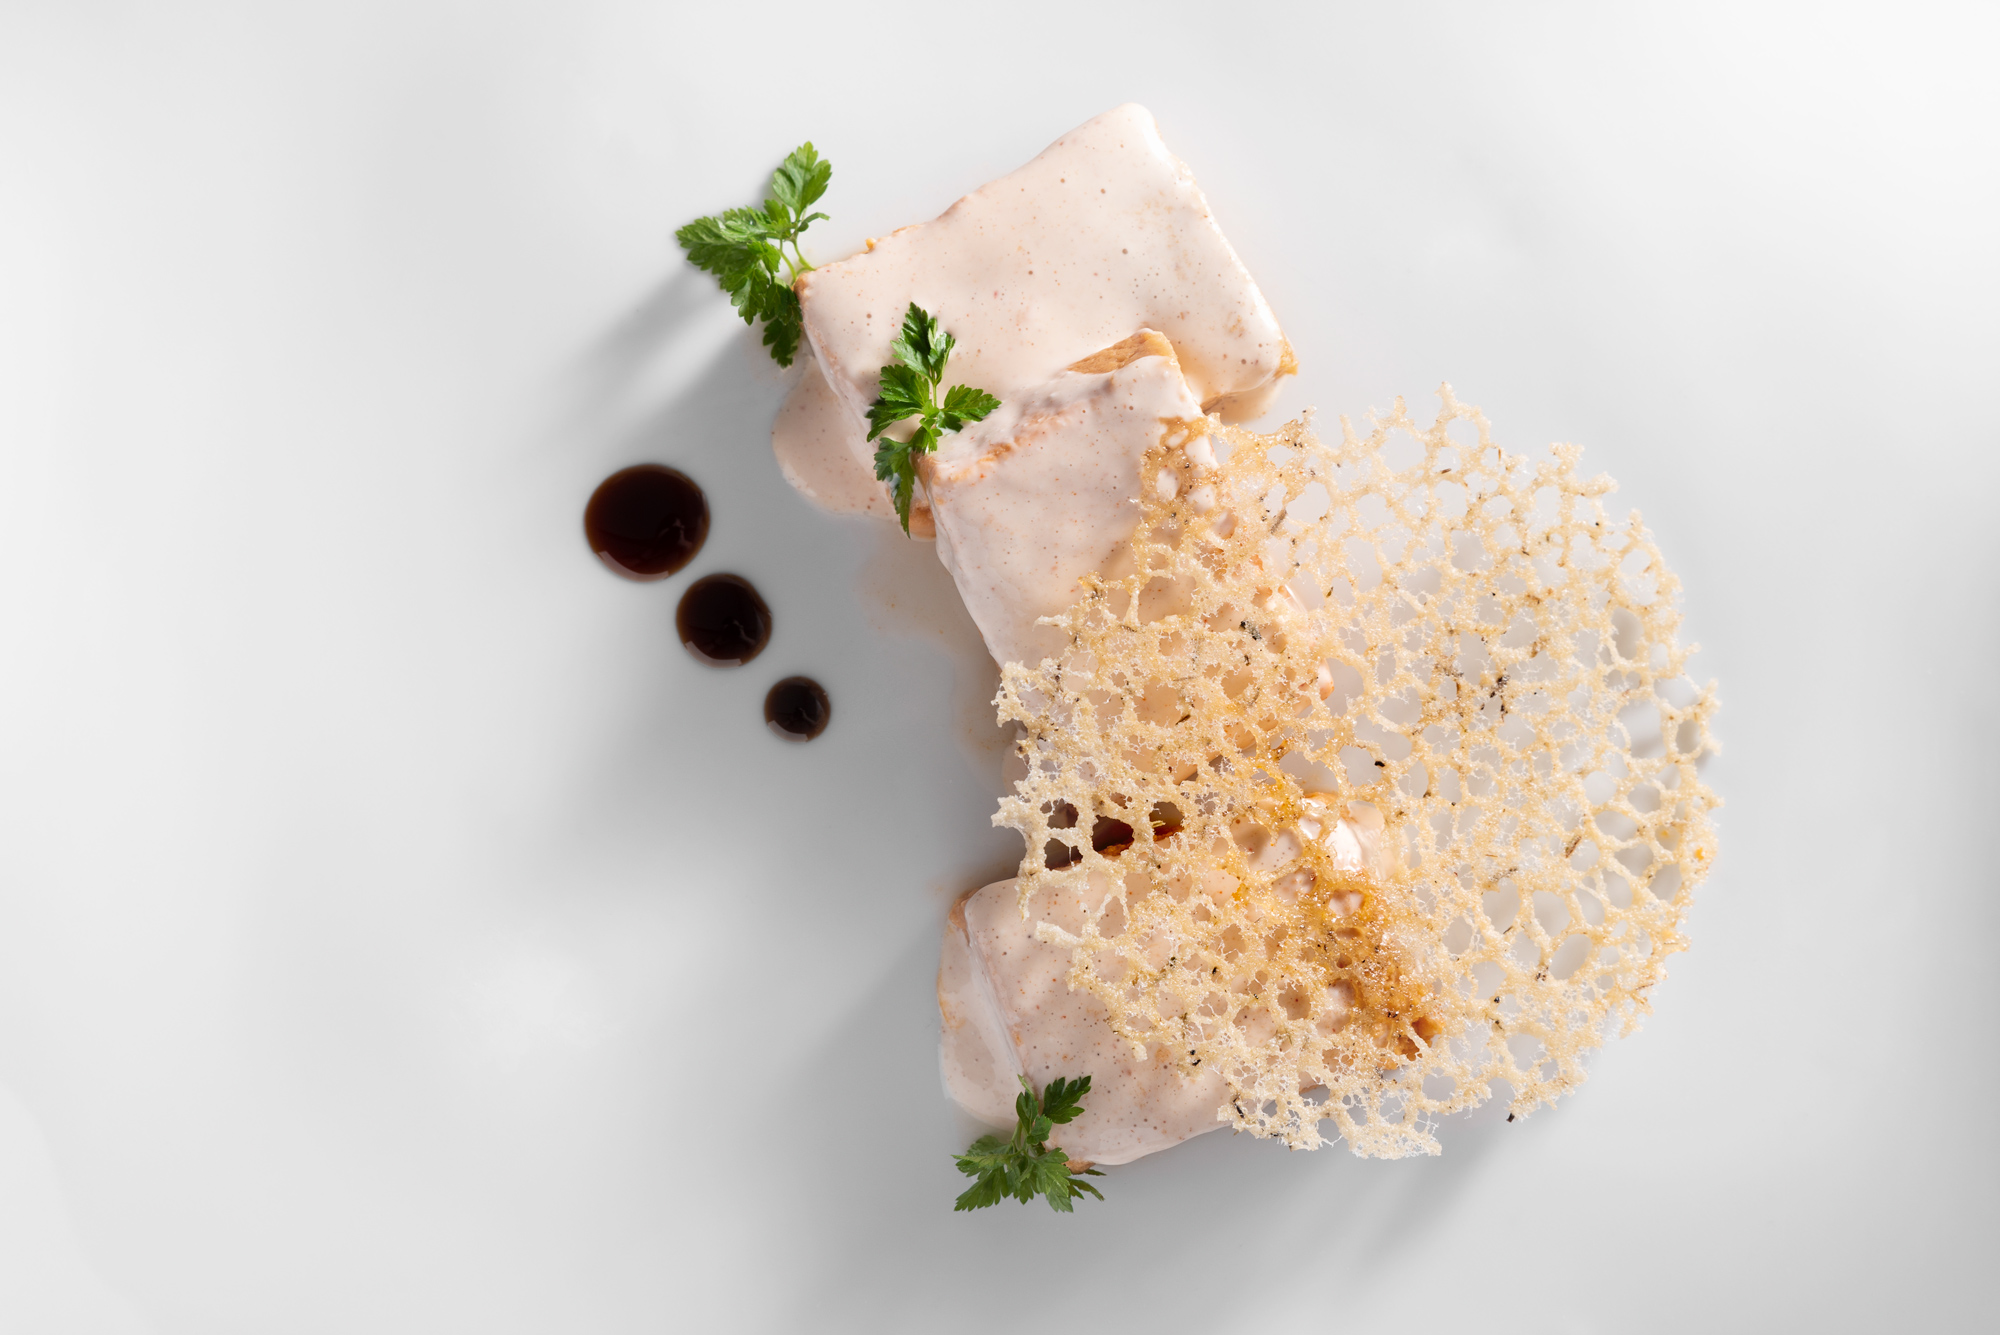 Como iluminar | Fotografía Gastronómica | Dani Vottero